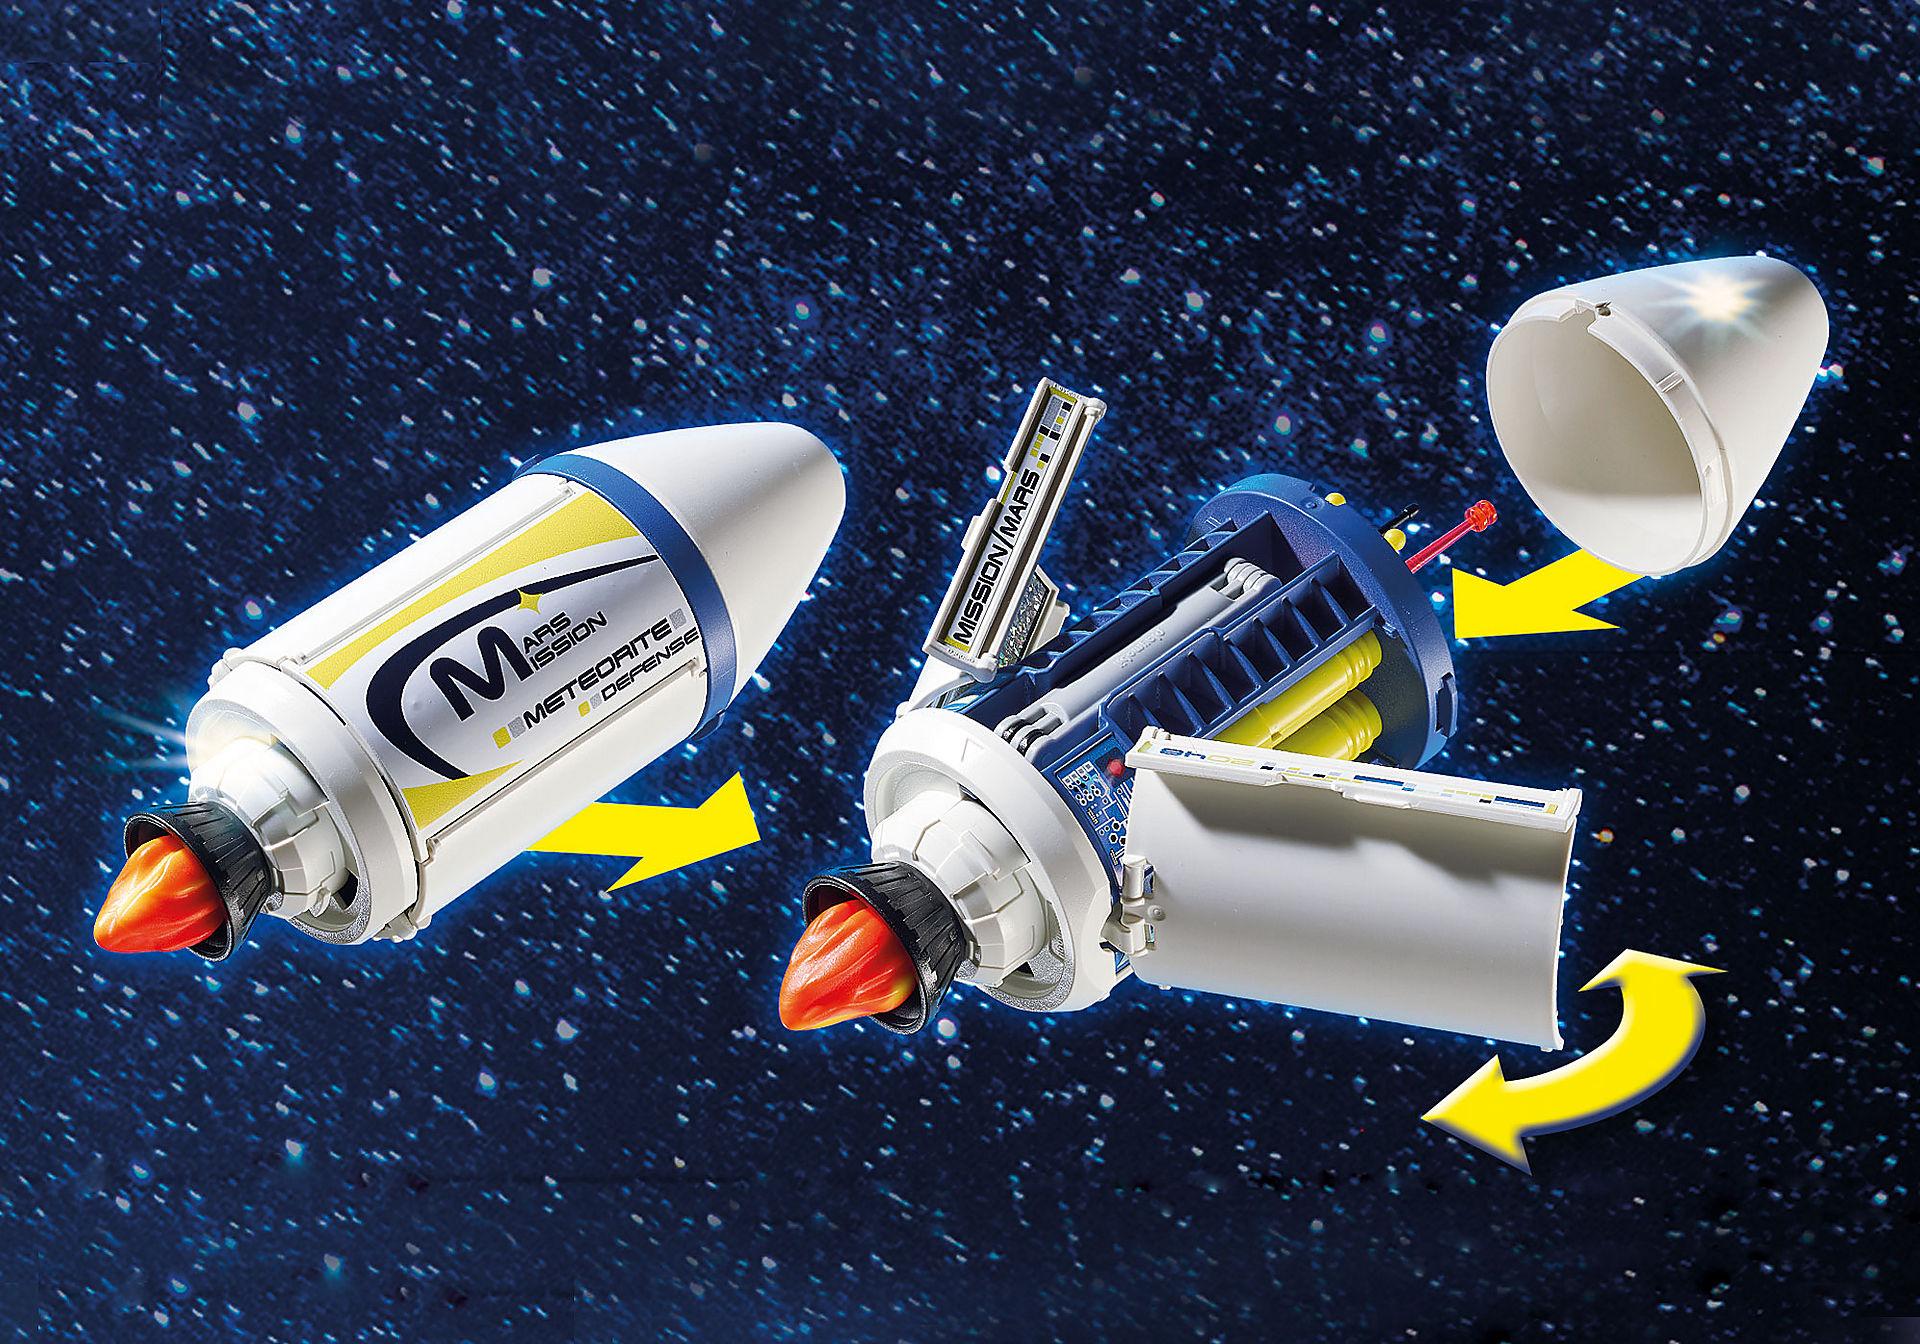 http://media.playmobil.com/i/playmobil/9490_product_extra1/Διαστημικό κανόνι Λέιζερ